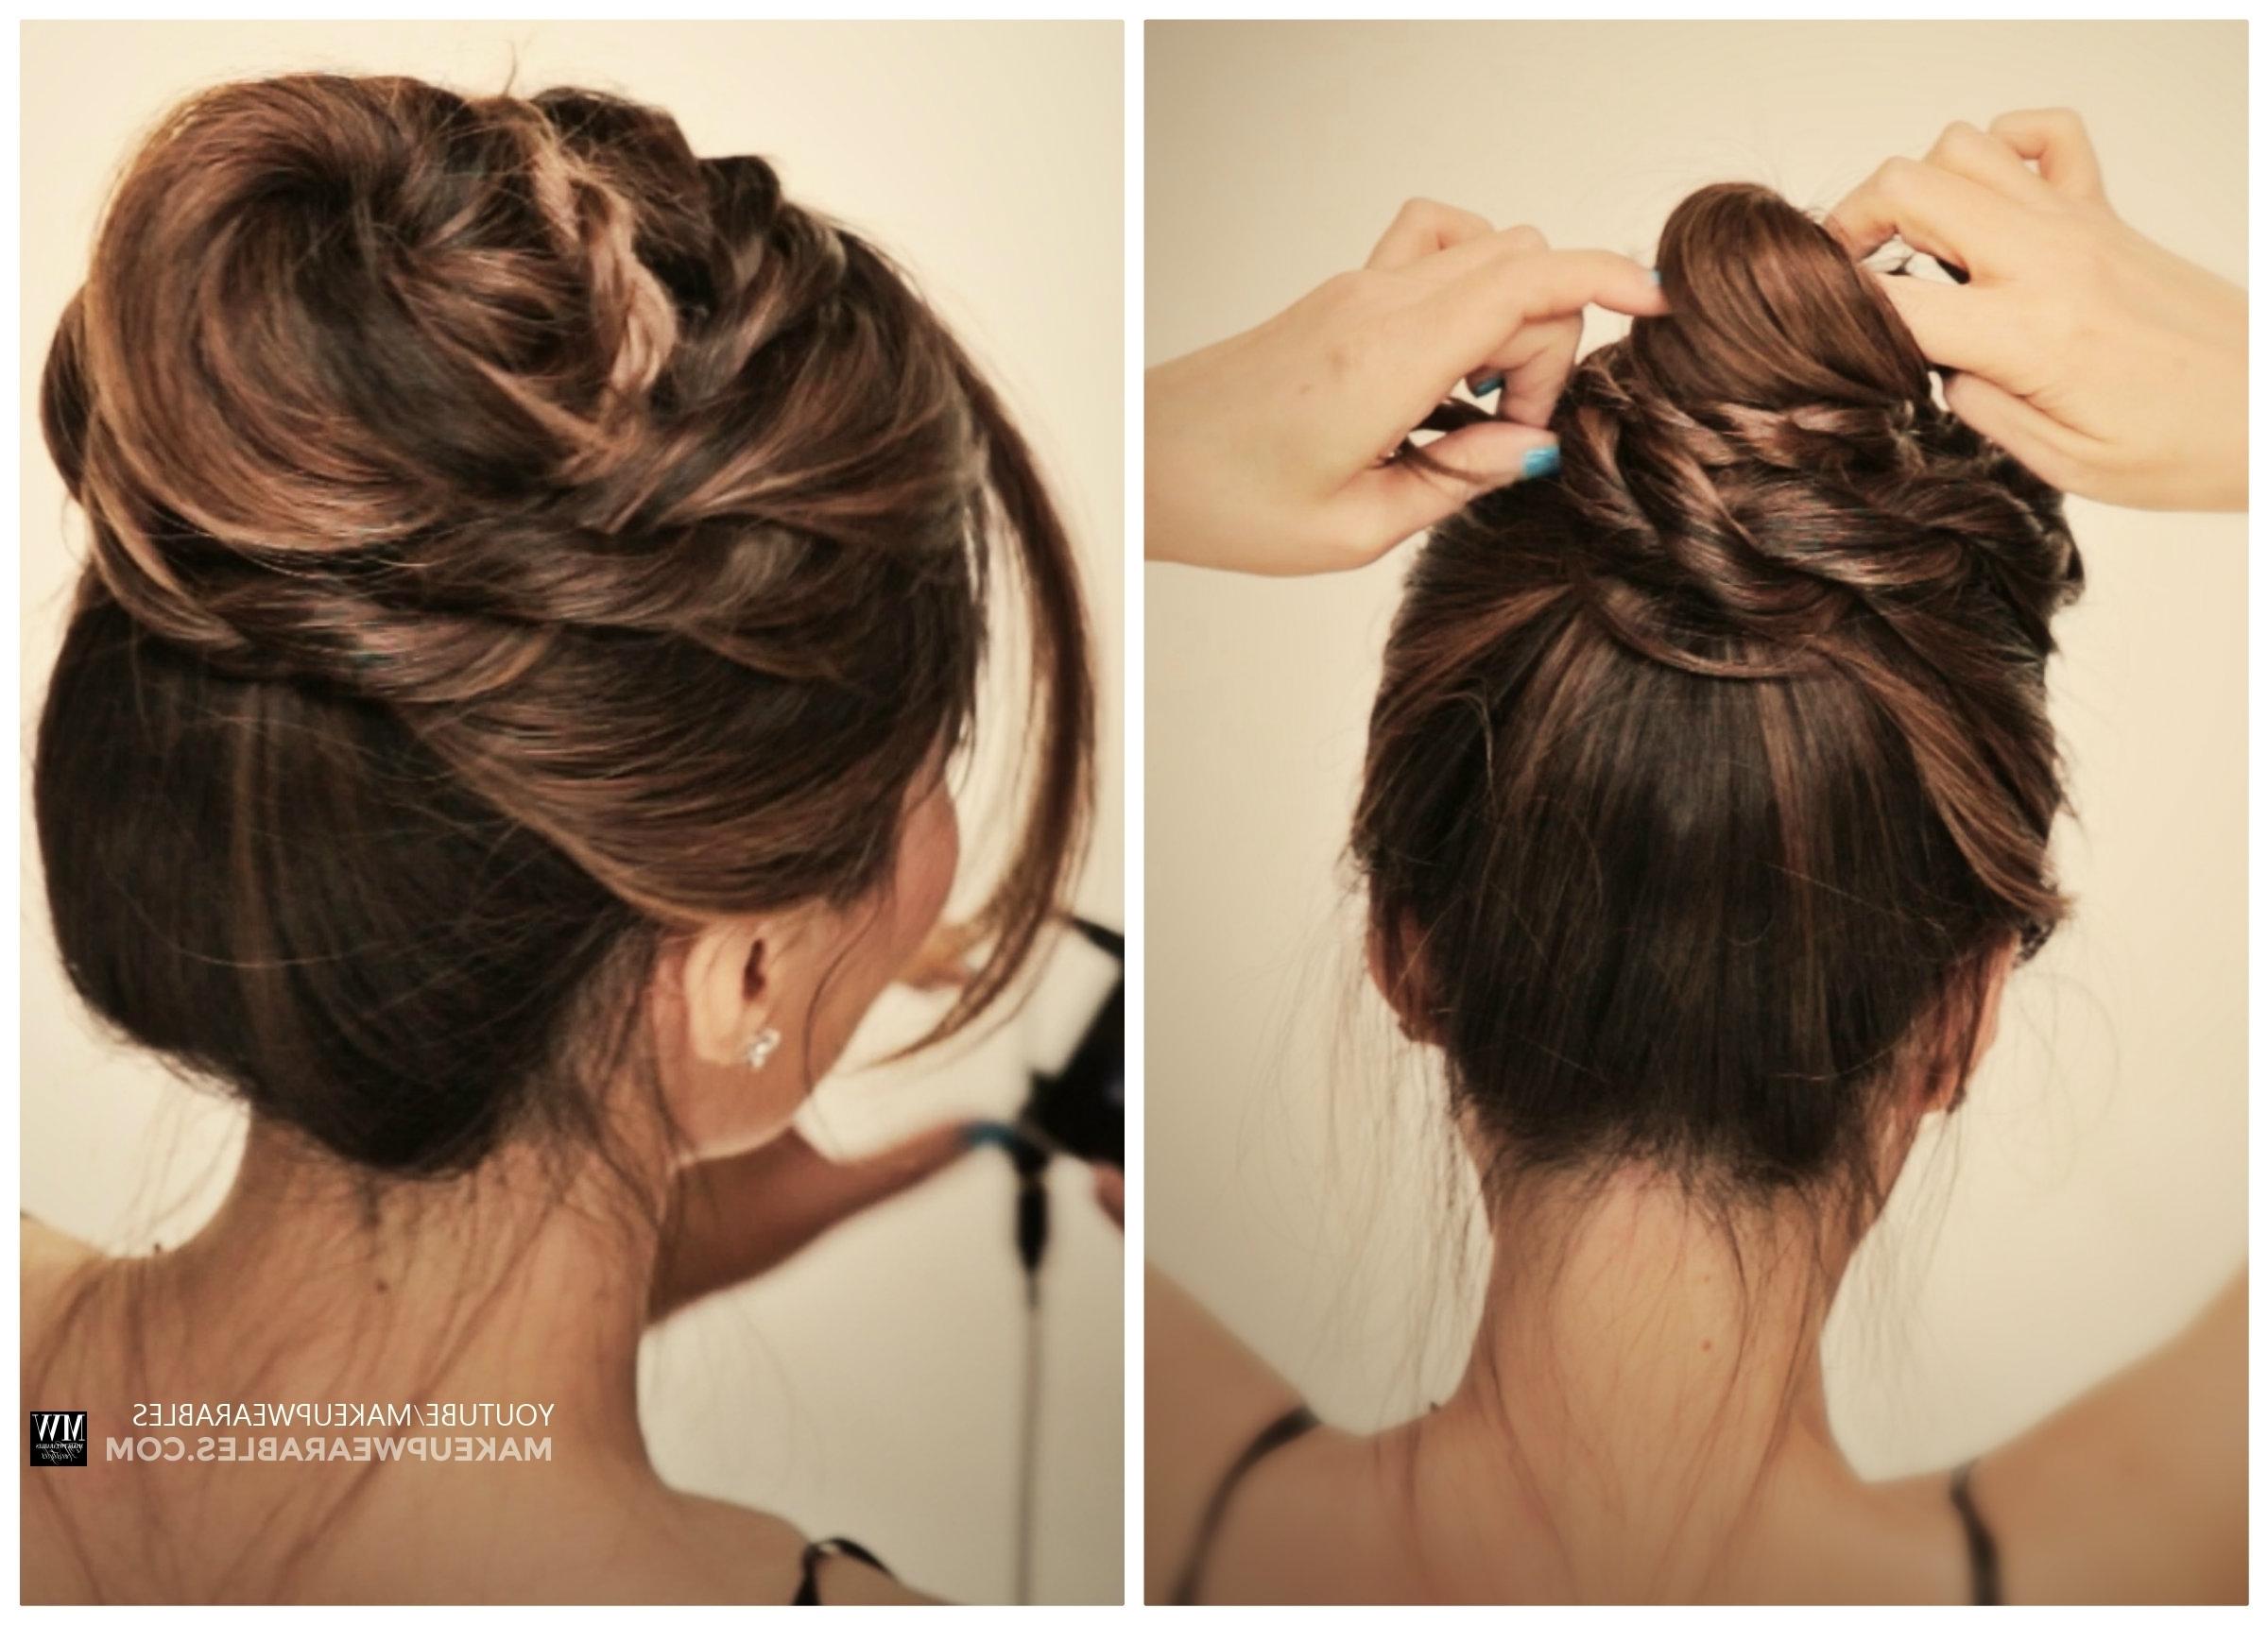 Cute Messy Bun Braids Ballerina Twisted Updo Hairstyle | Medium Hair Inside Cute Updo Hairstyles For Long Hair (View 1 of 15)